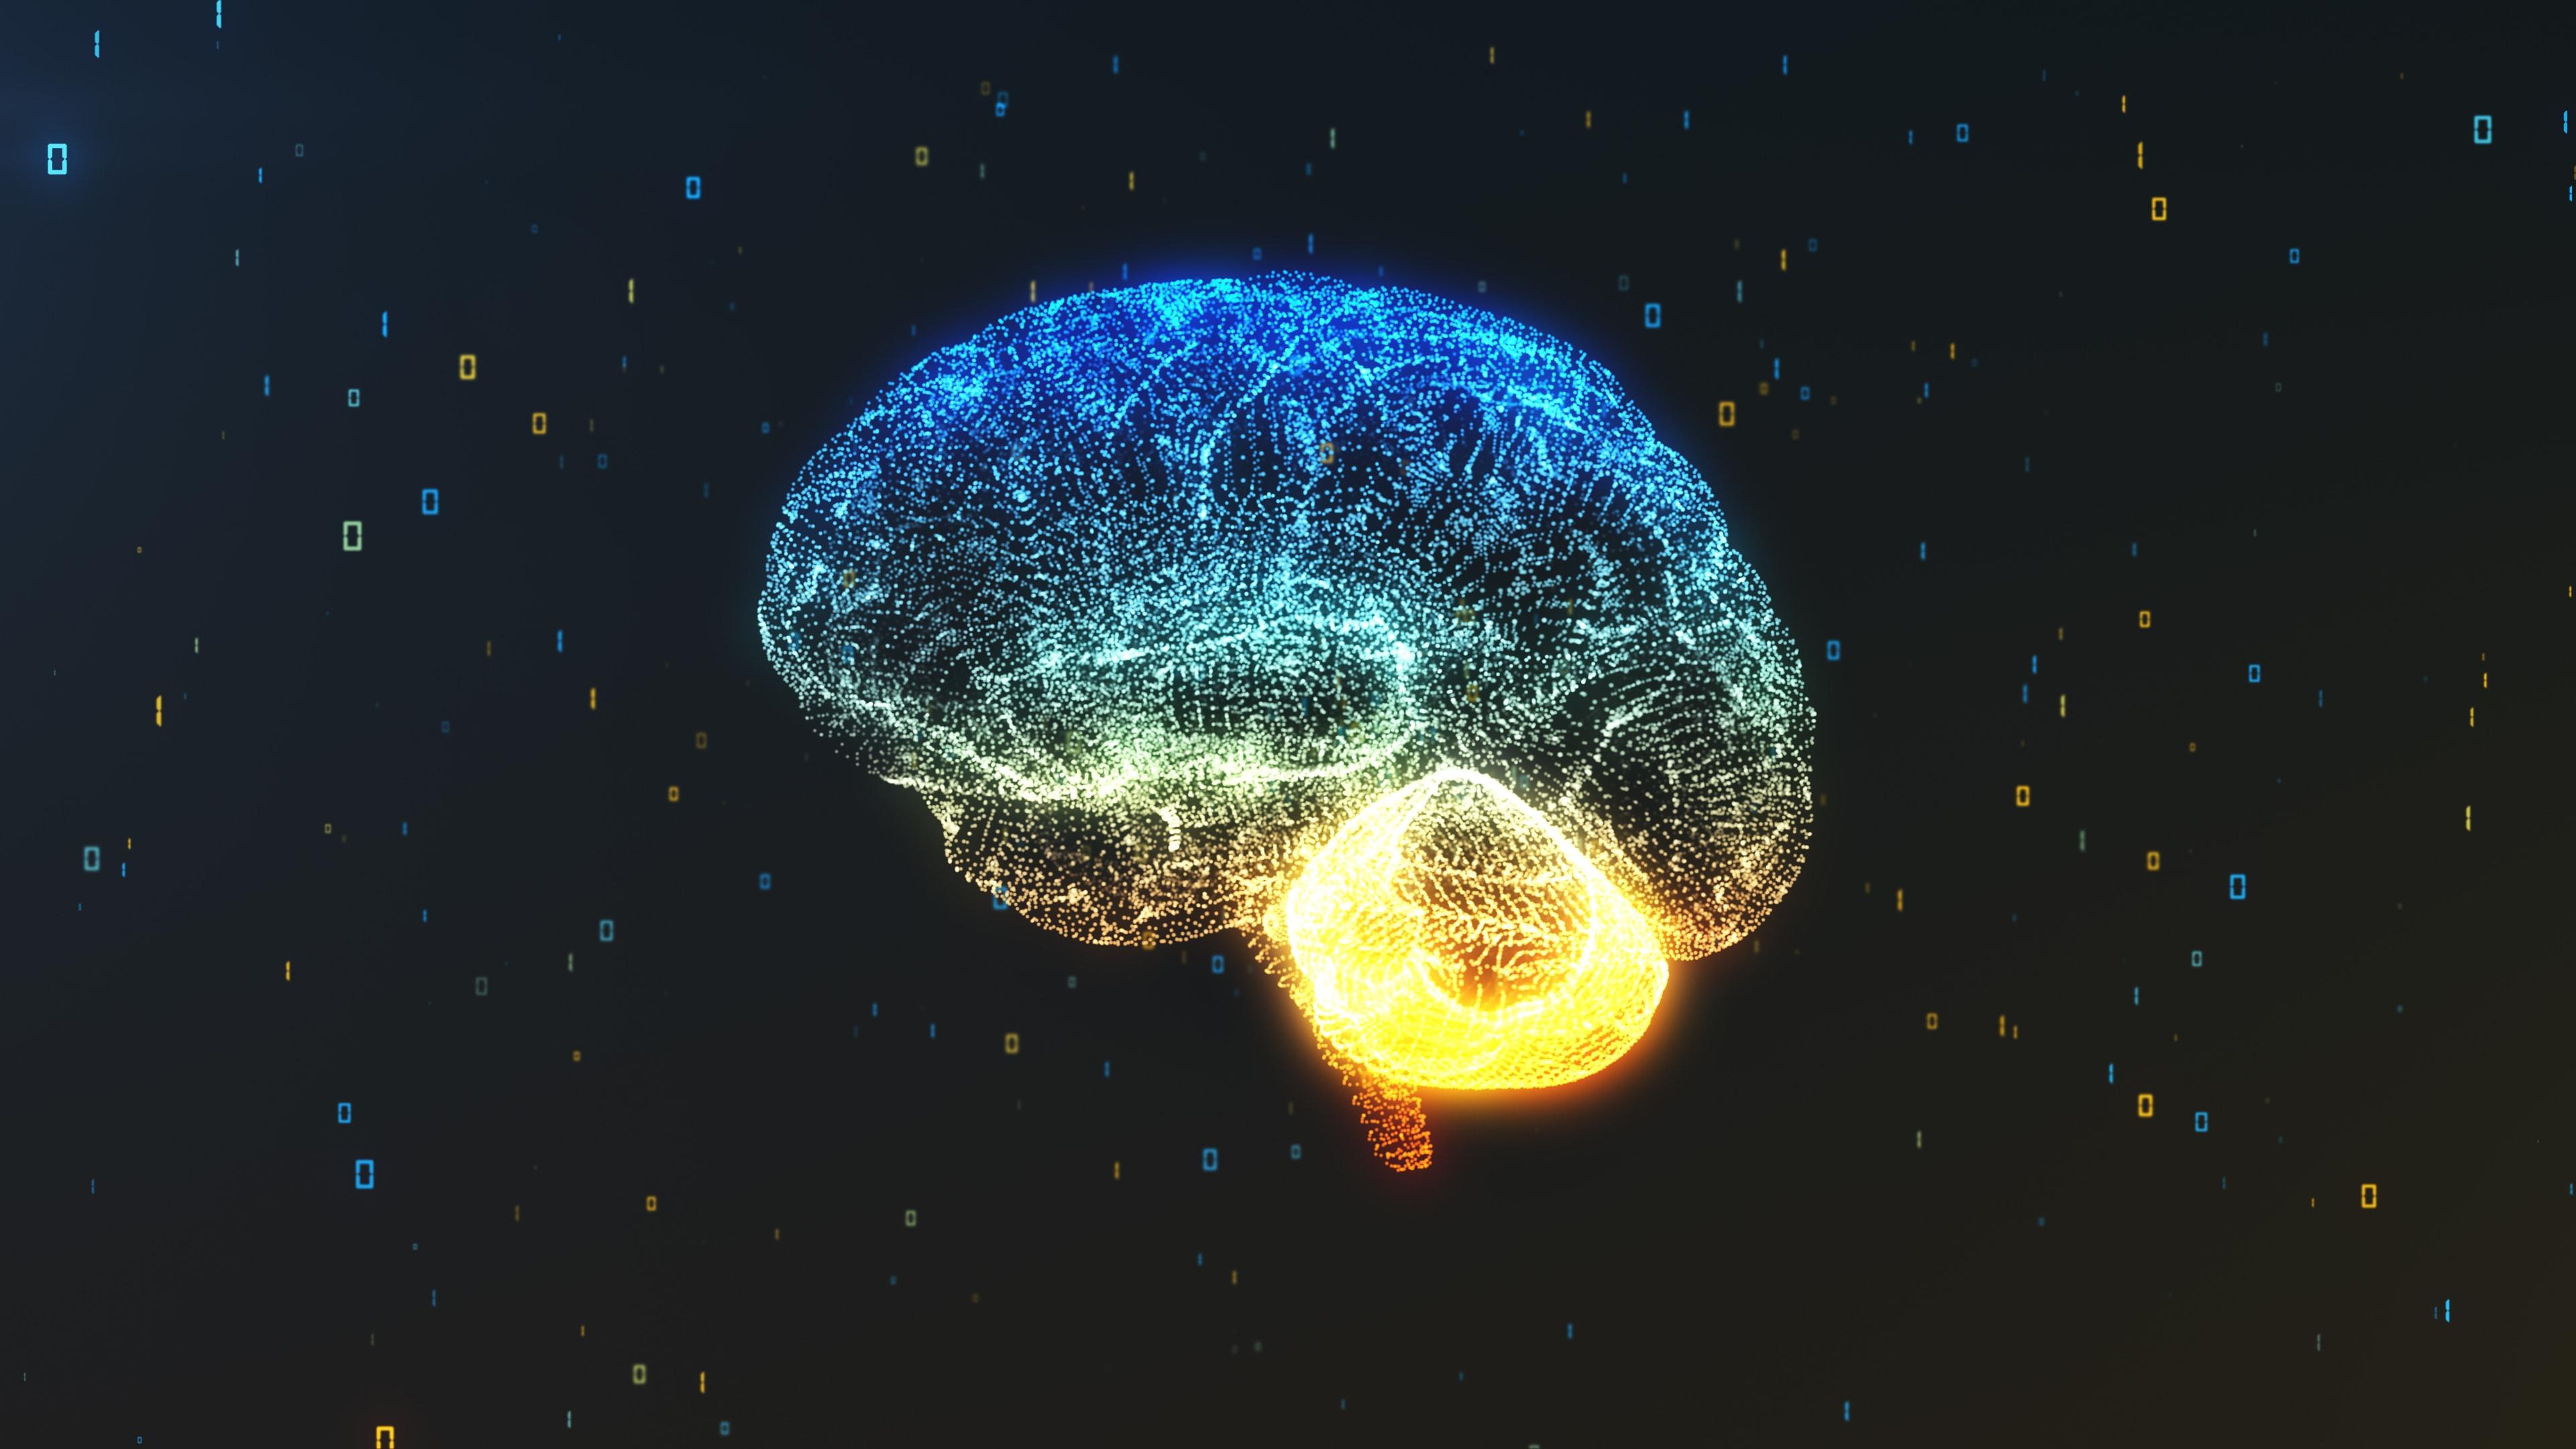 resized-digital-brain-numbers-floating-min